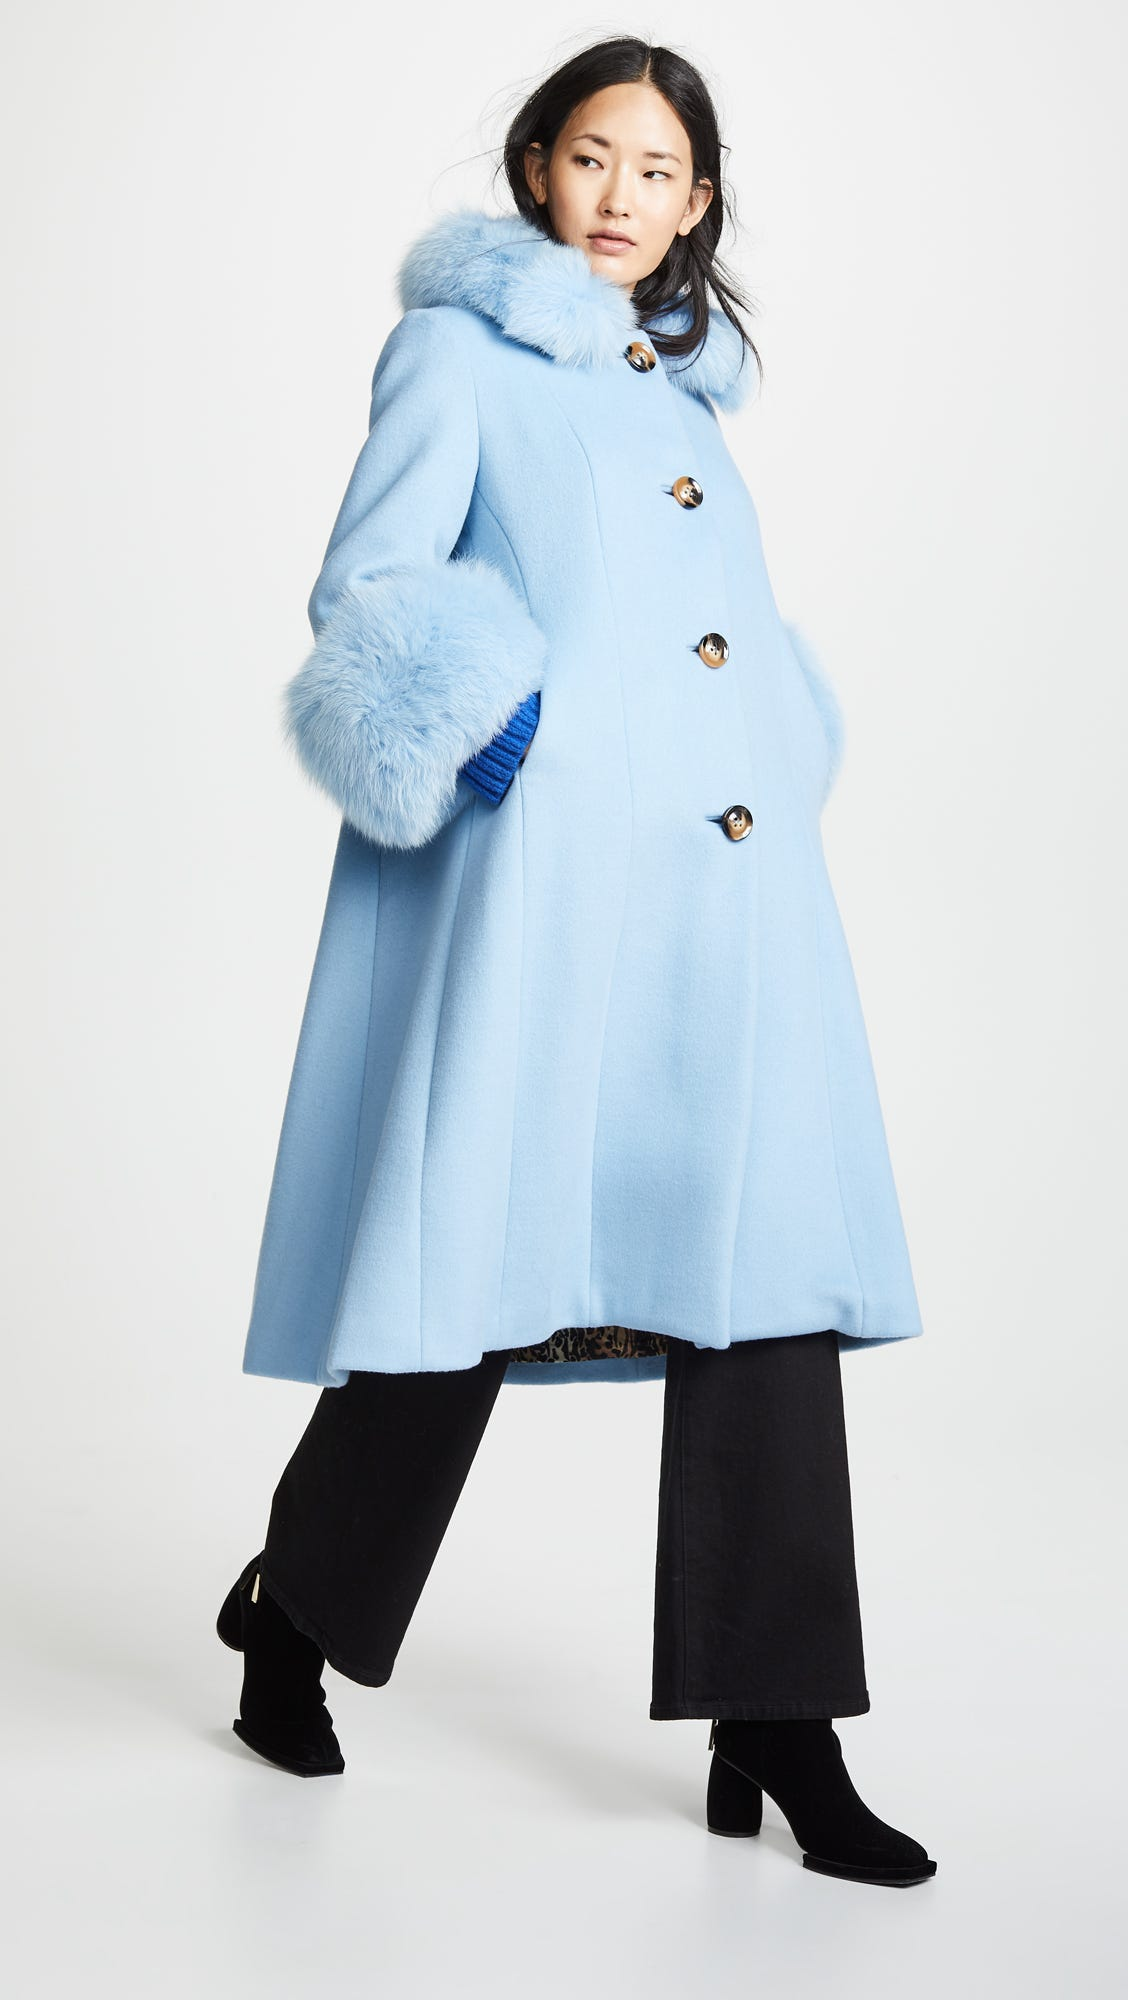 cafd2c459 Best Warm Dressy Winter Coats, Evening Jackets 2018